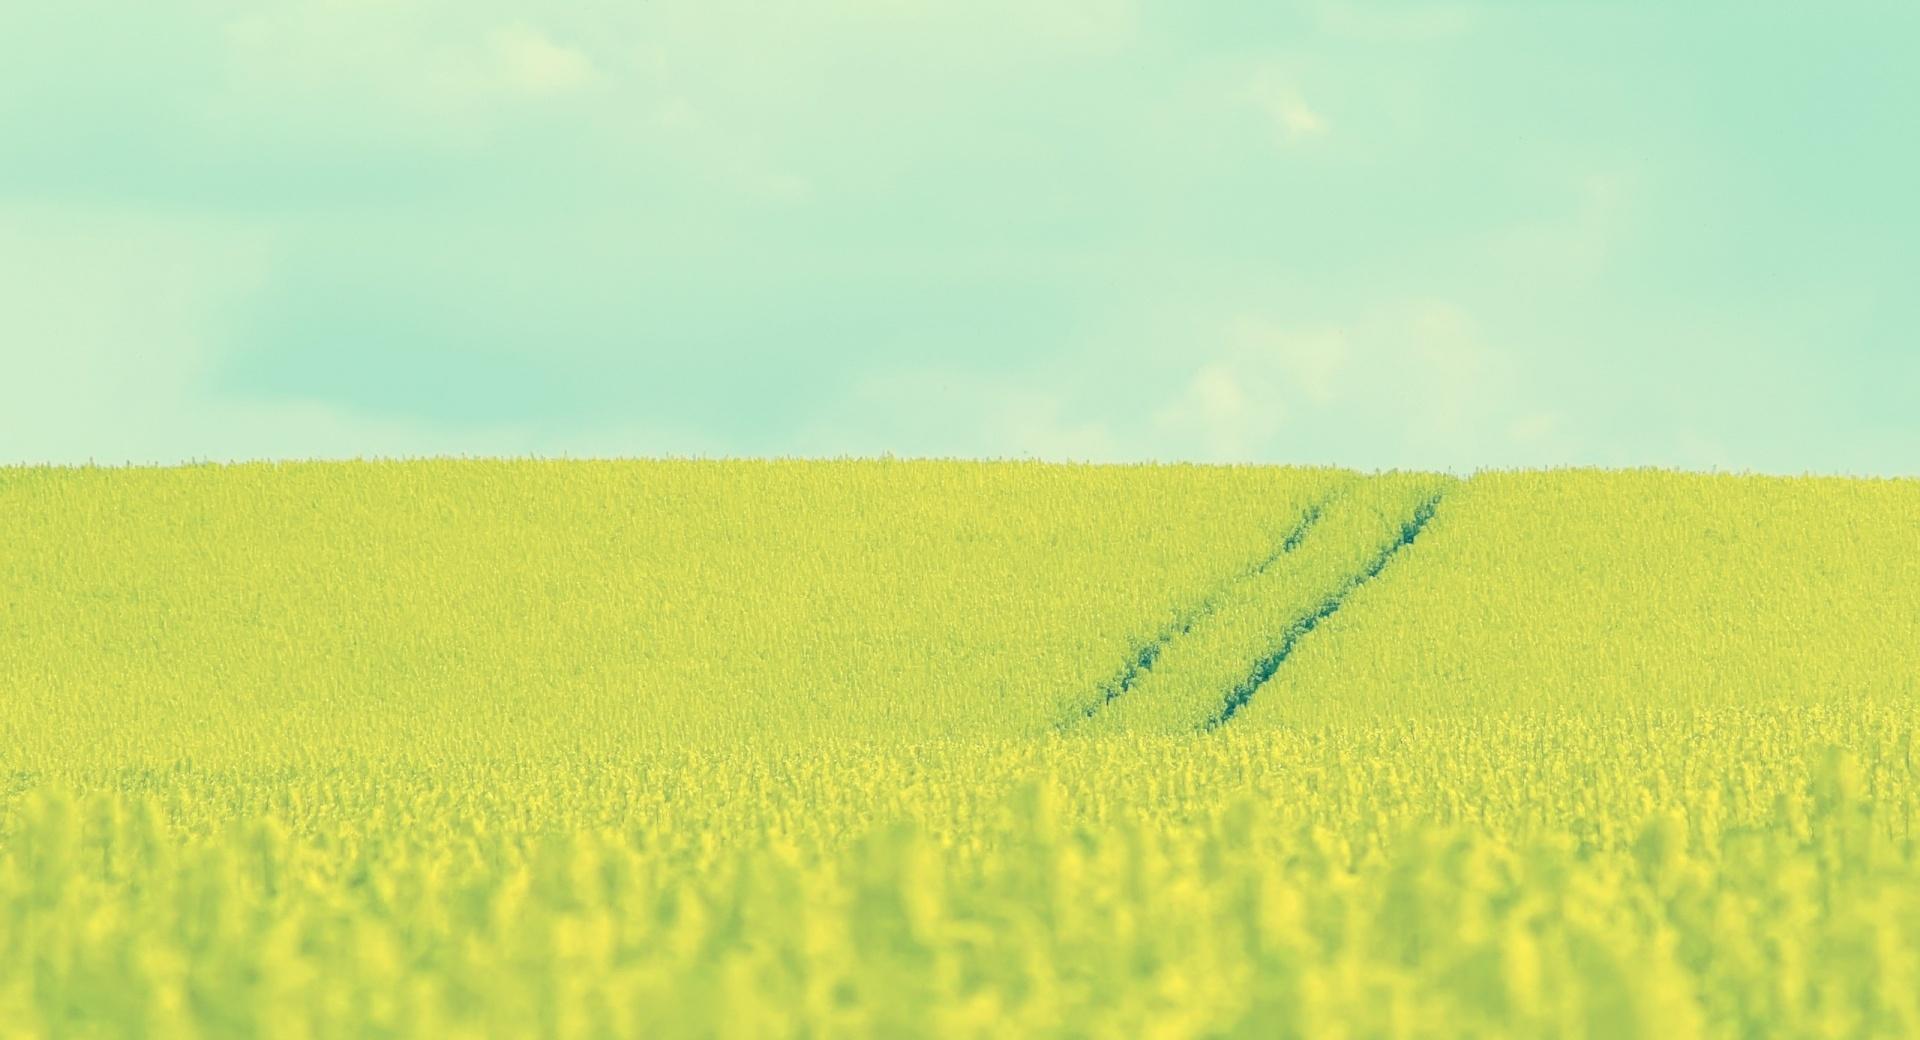 Beautiful Mustard Field wallpapers HD quality